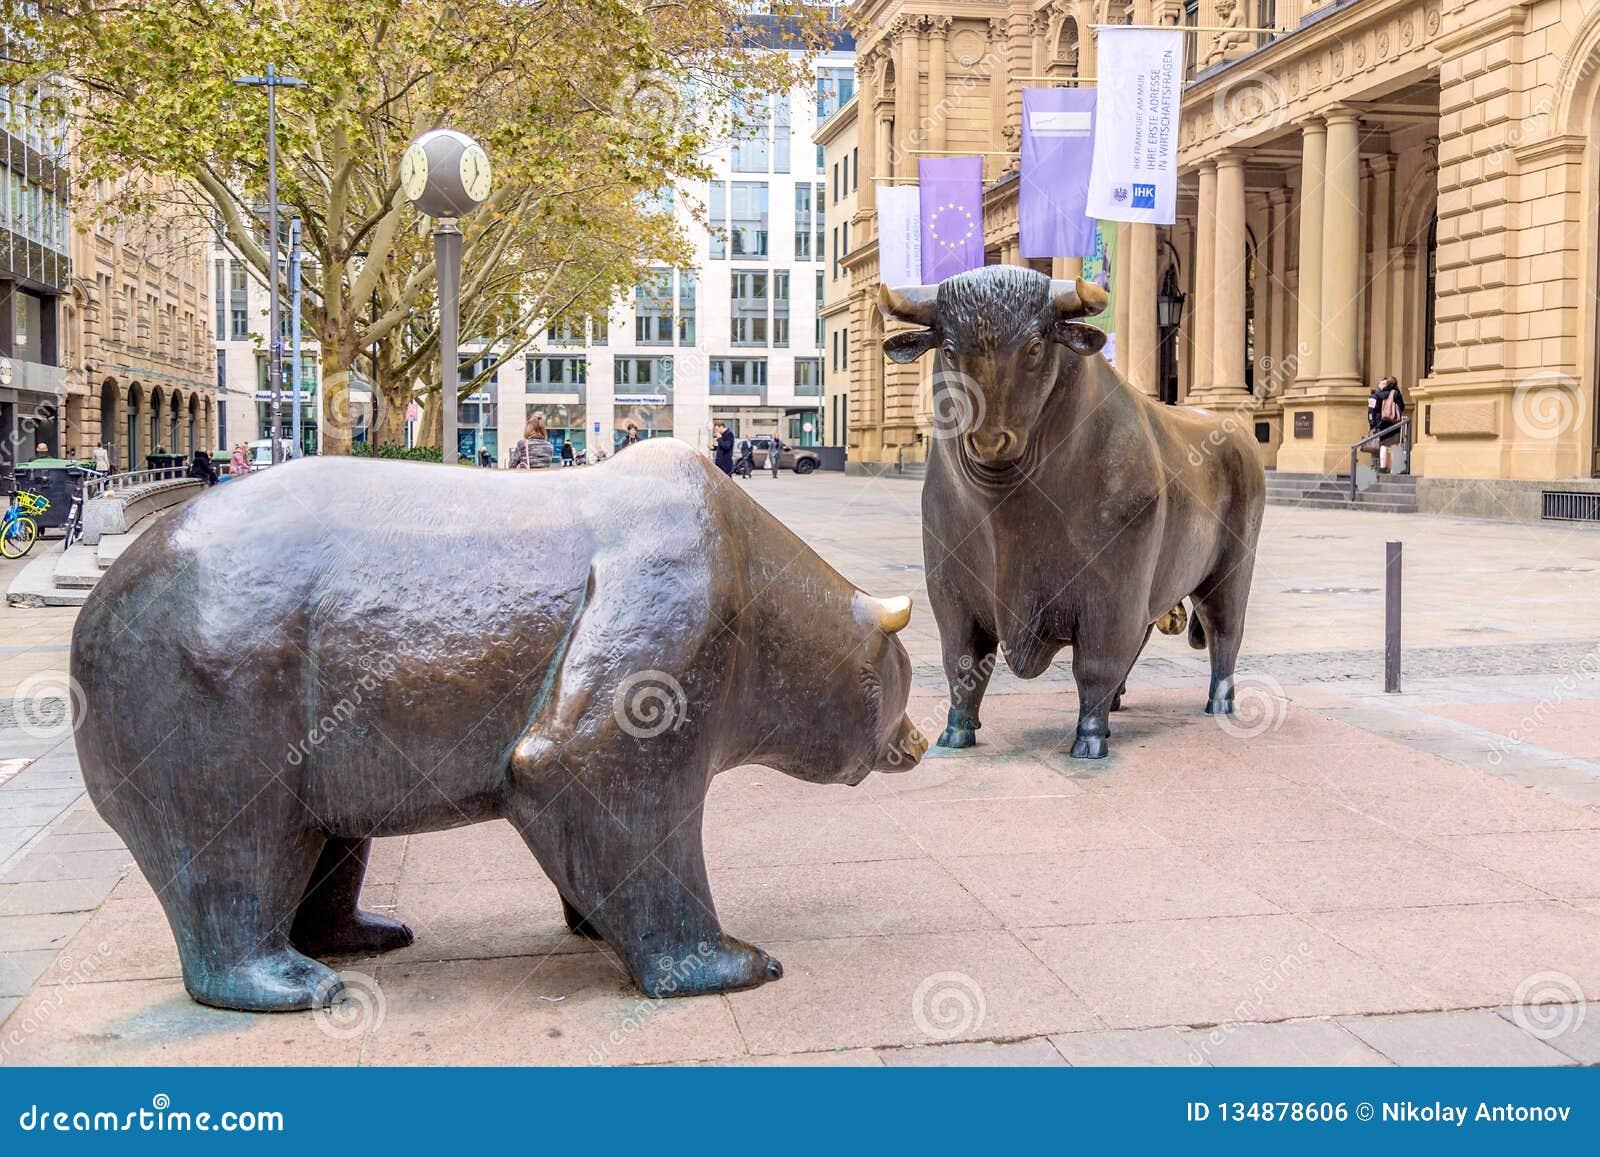 Frankfurt, germany - November, 2018: Bear and Bull sculpture near Frankfurt Stock Exchange building